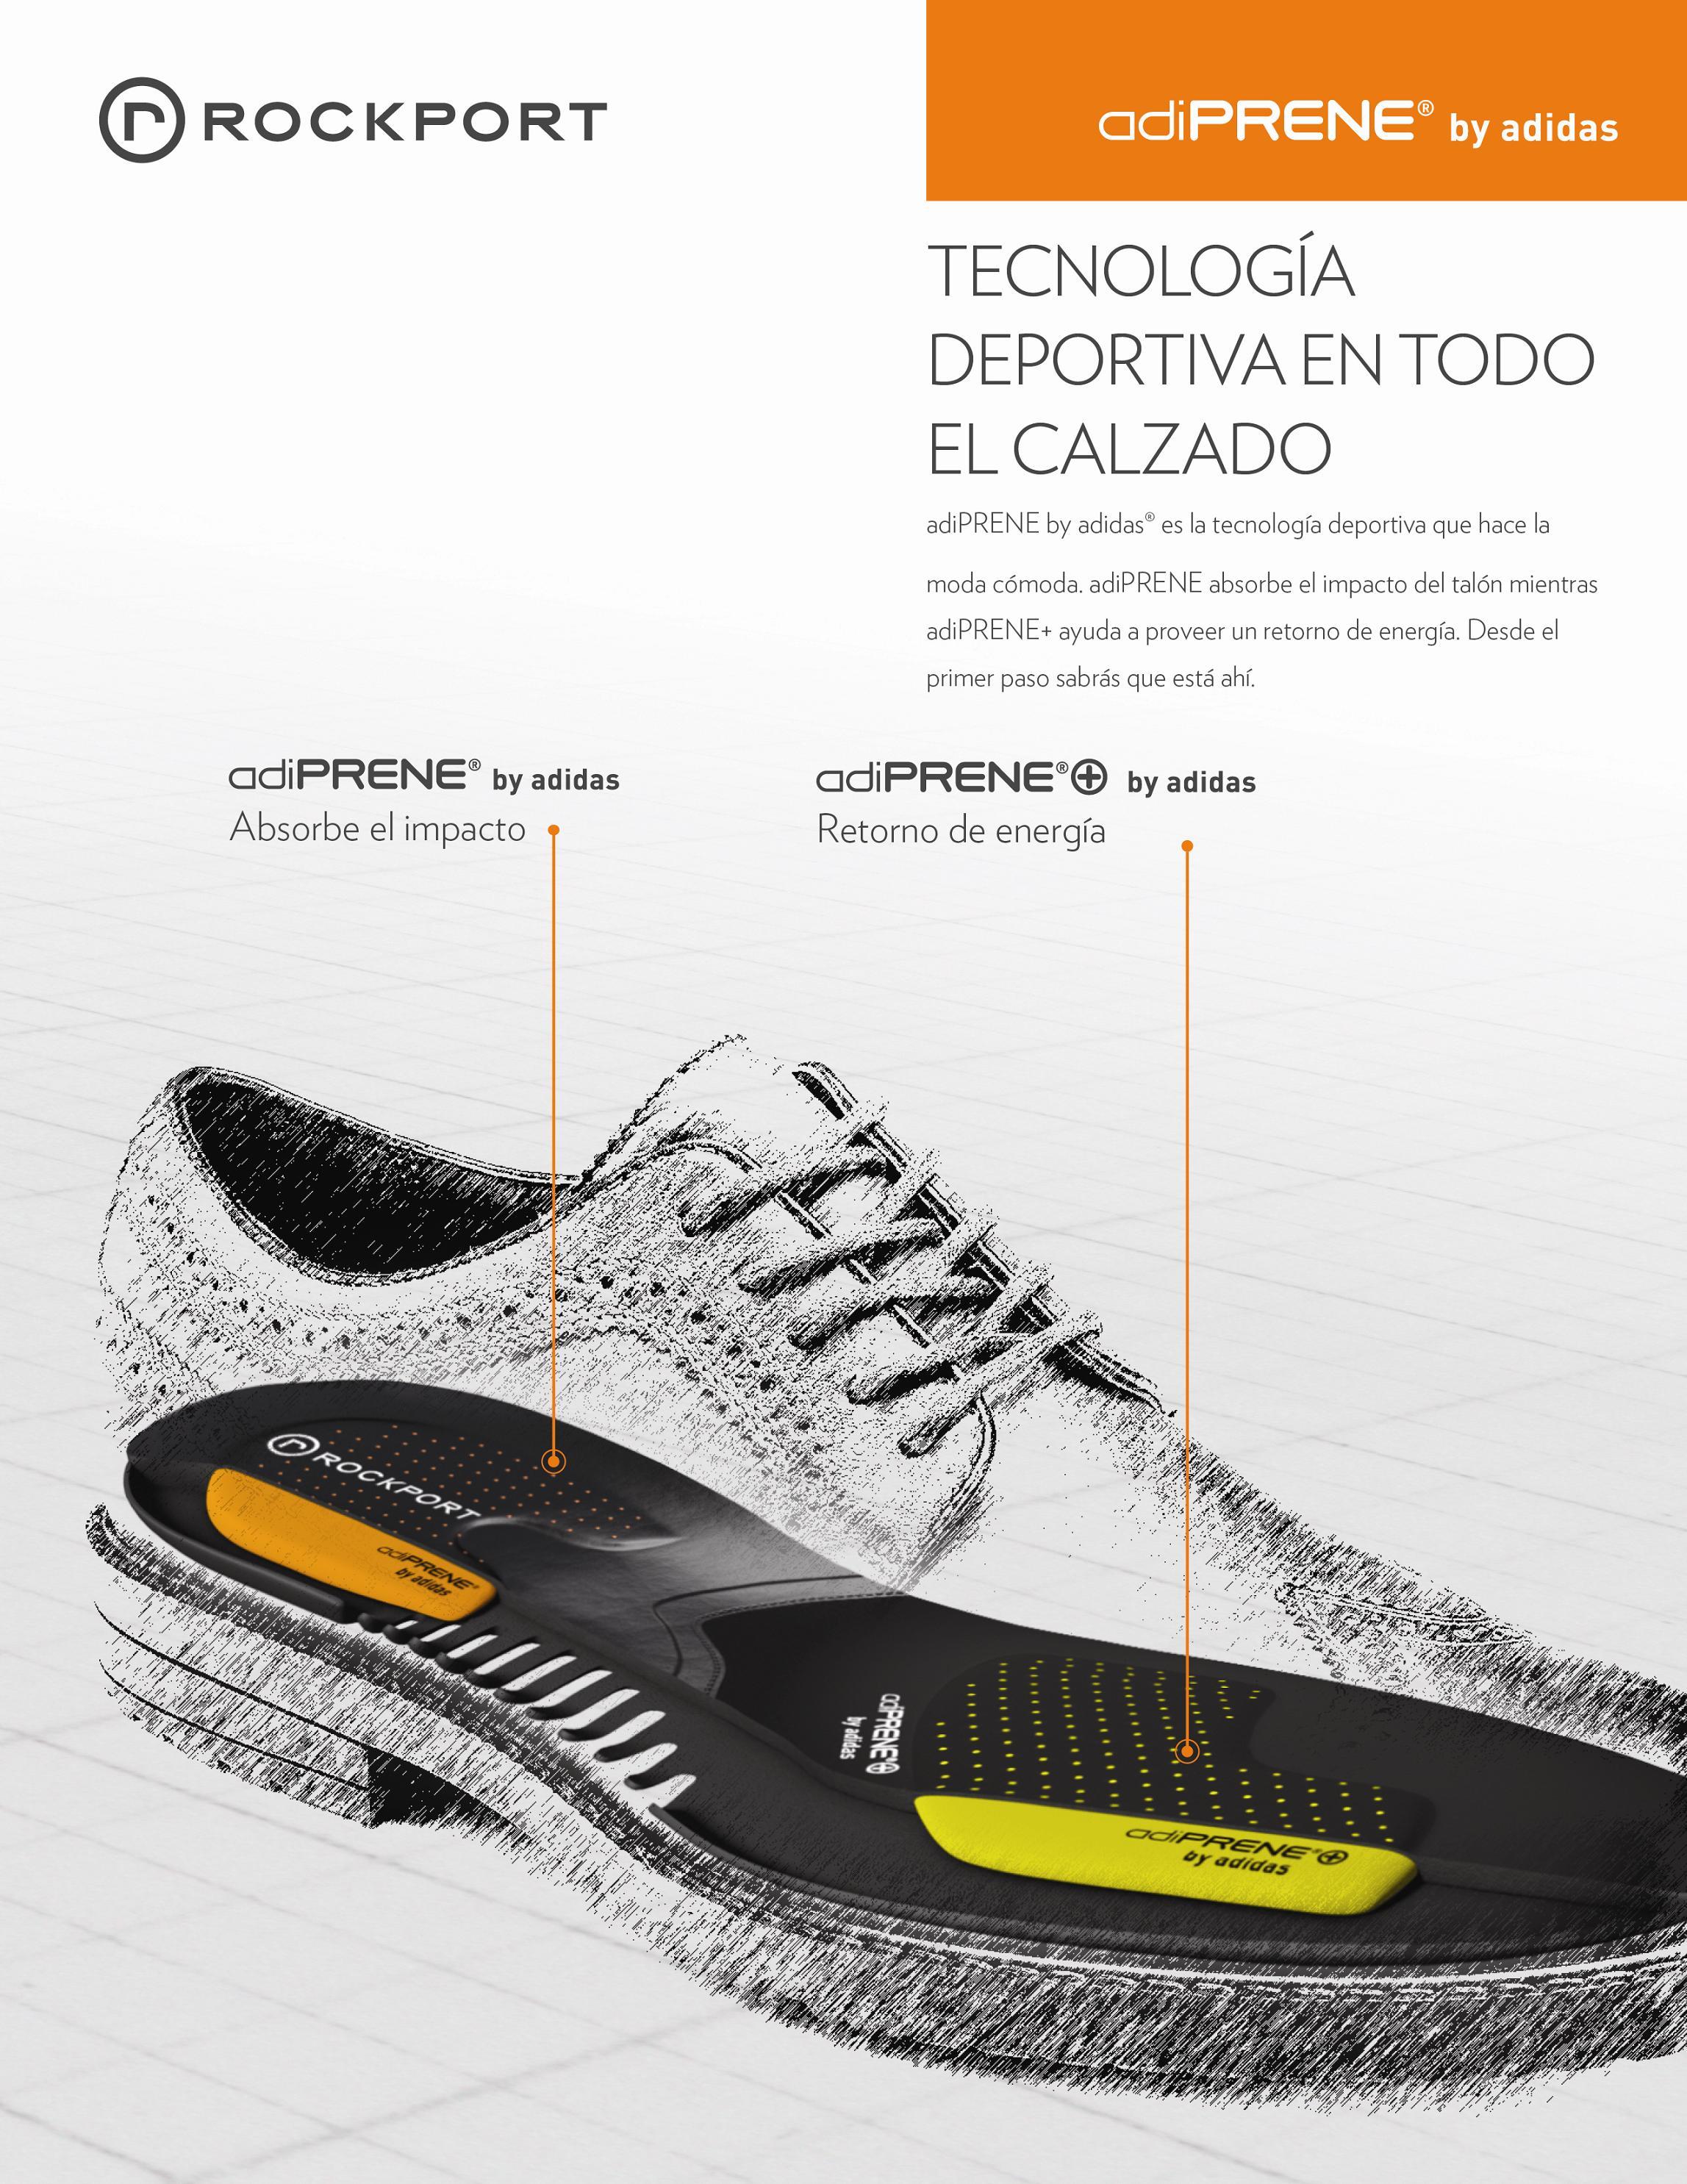 zapatos rockport adidas